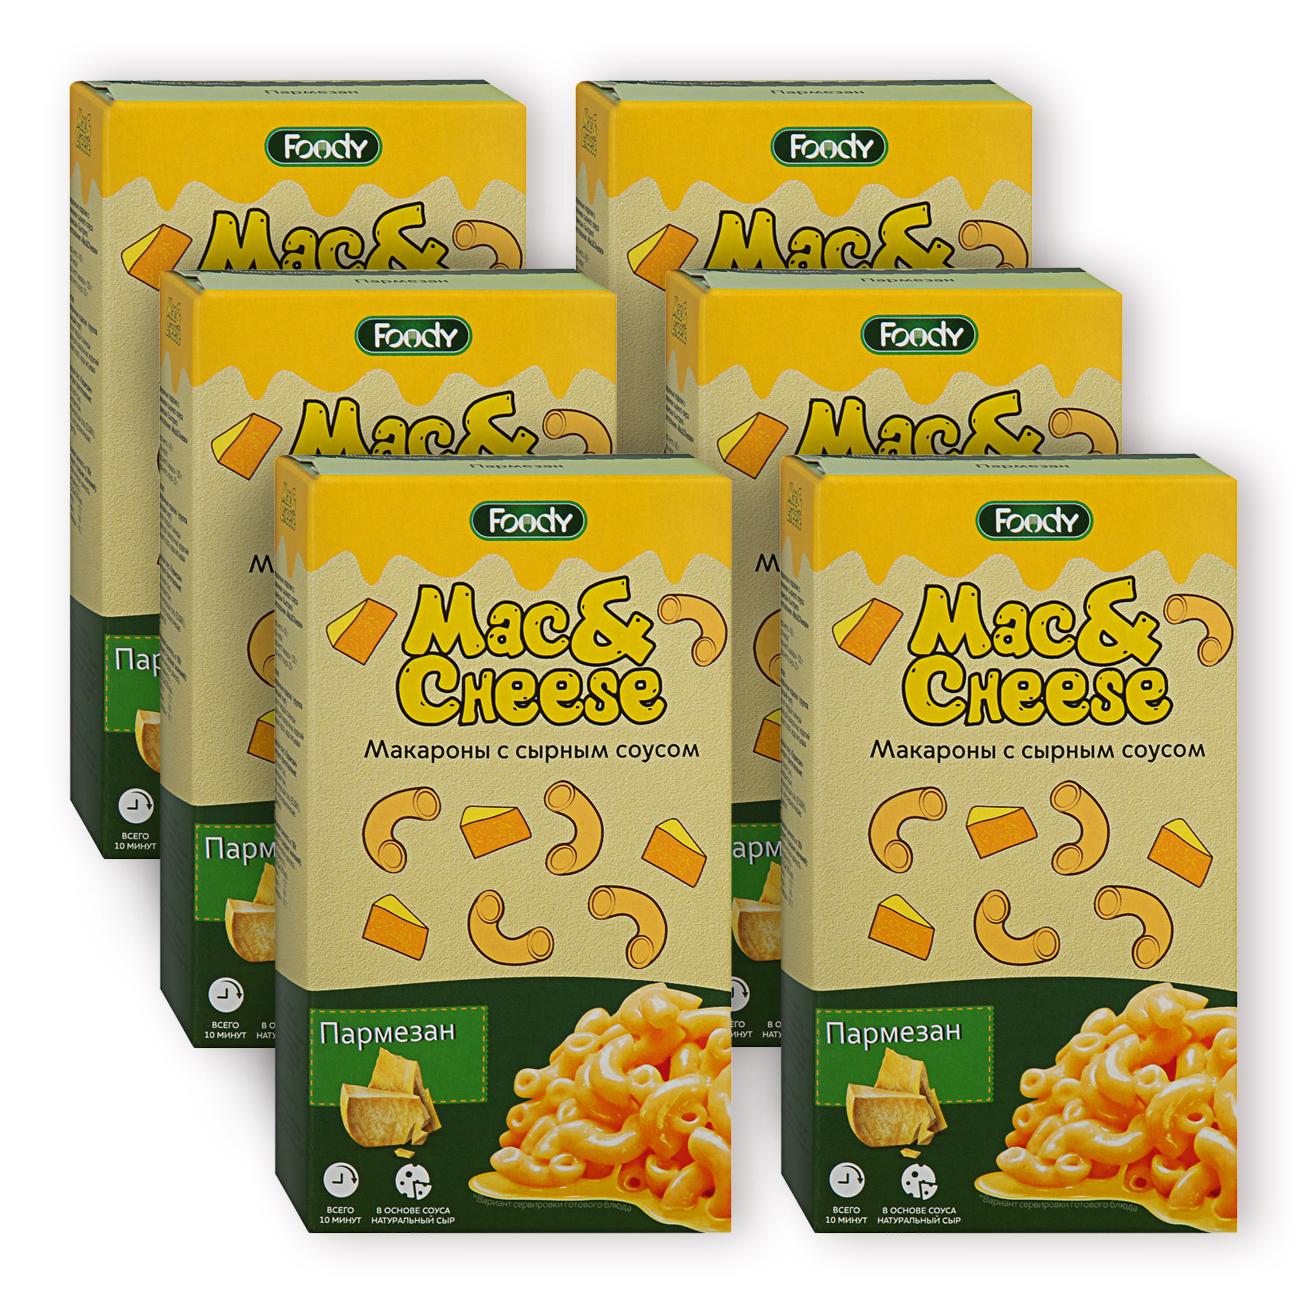 Foody Mac&Cheese Пармезан макароны с сырным соусом, 143г х 6шт